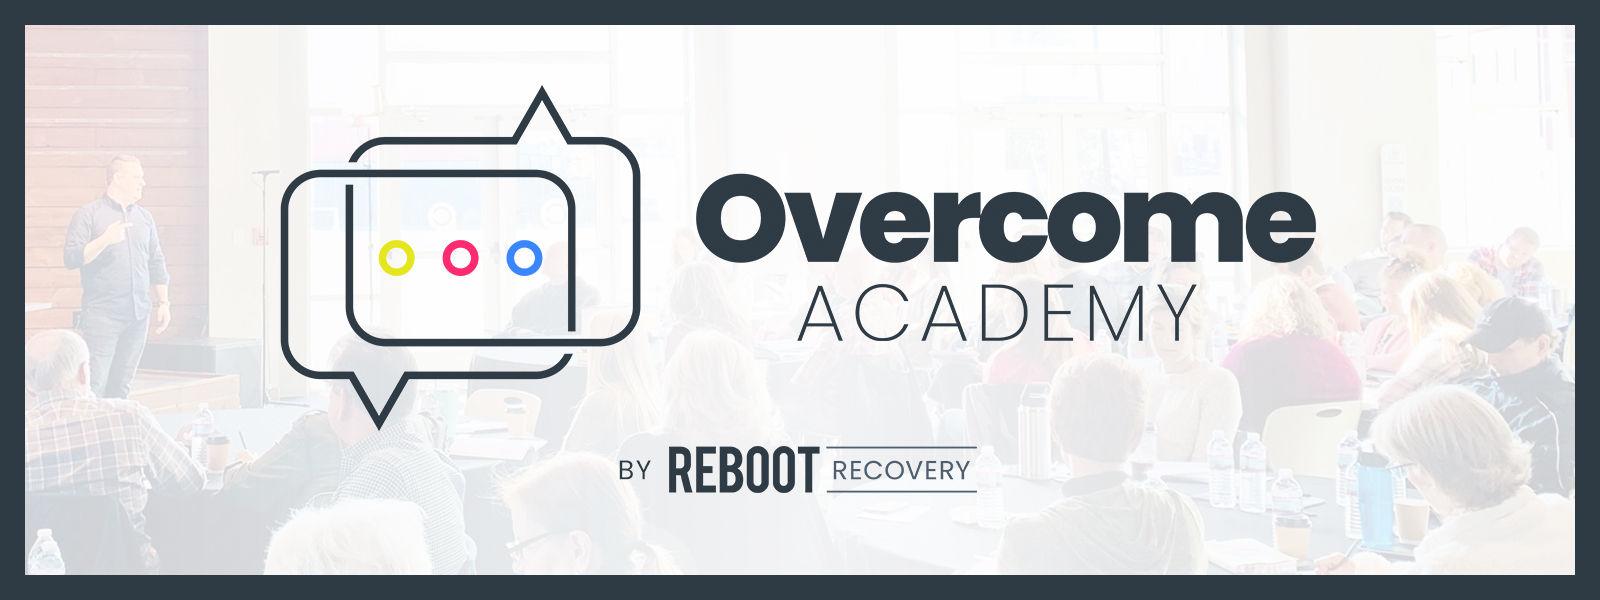 Overcome Academy